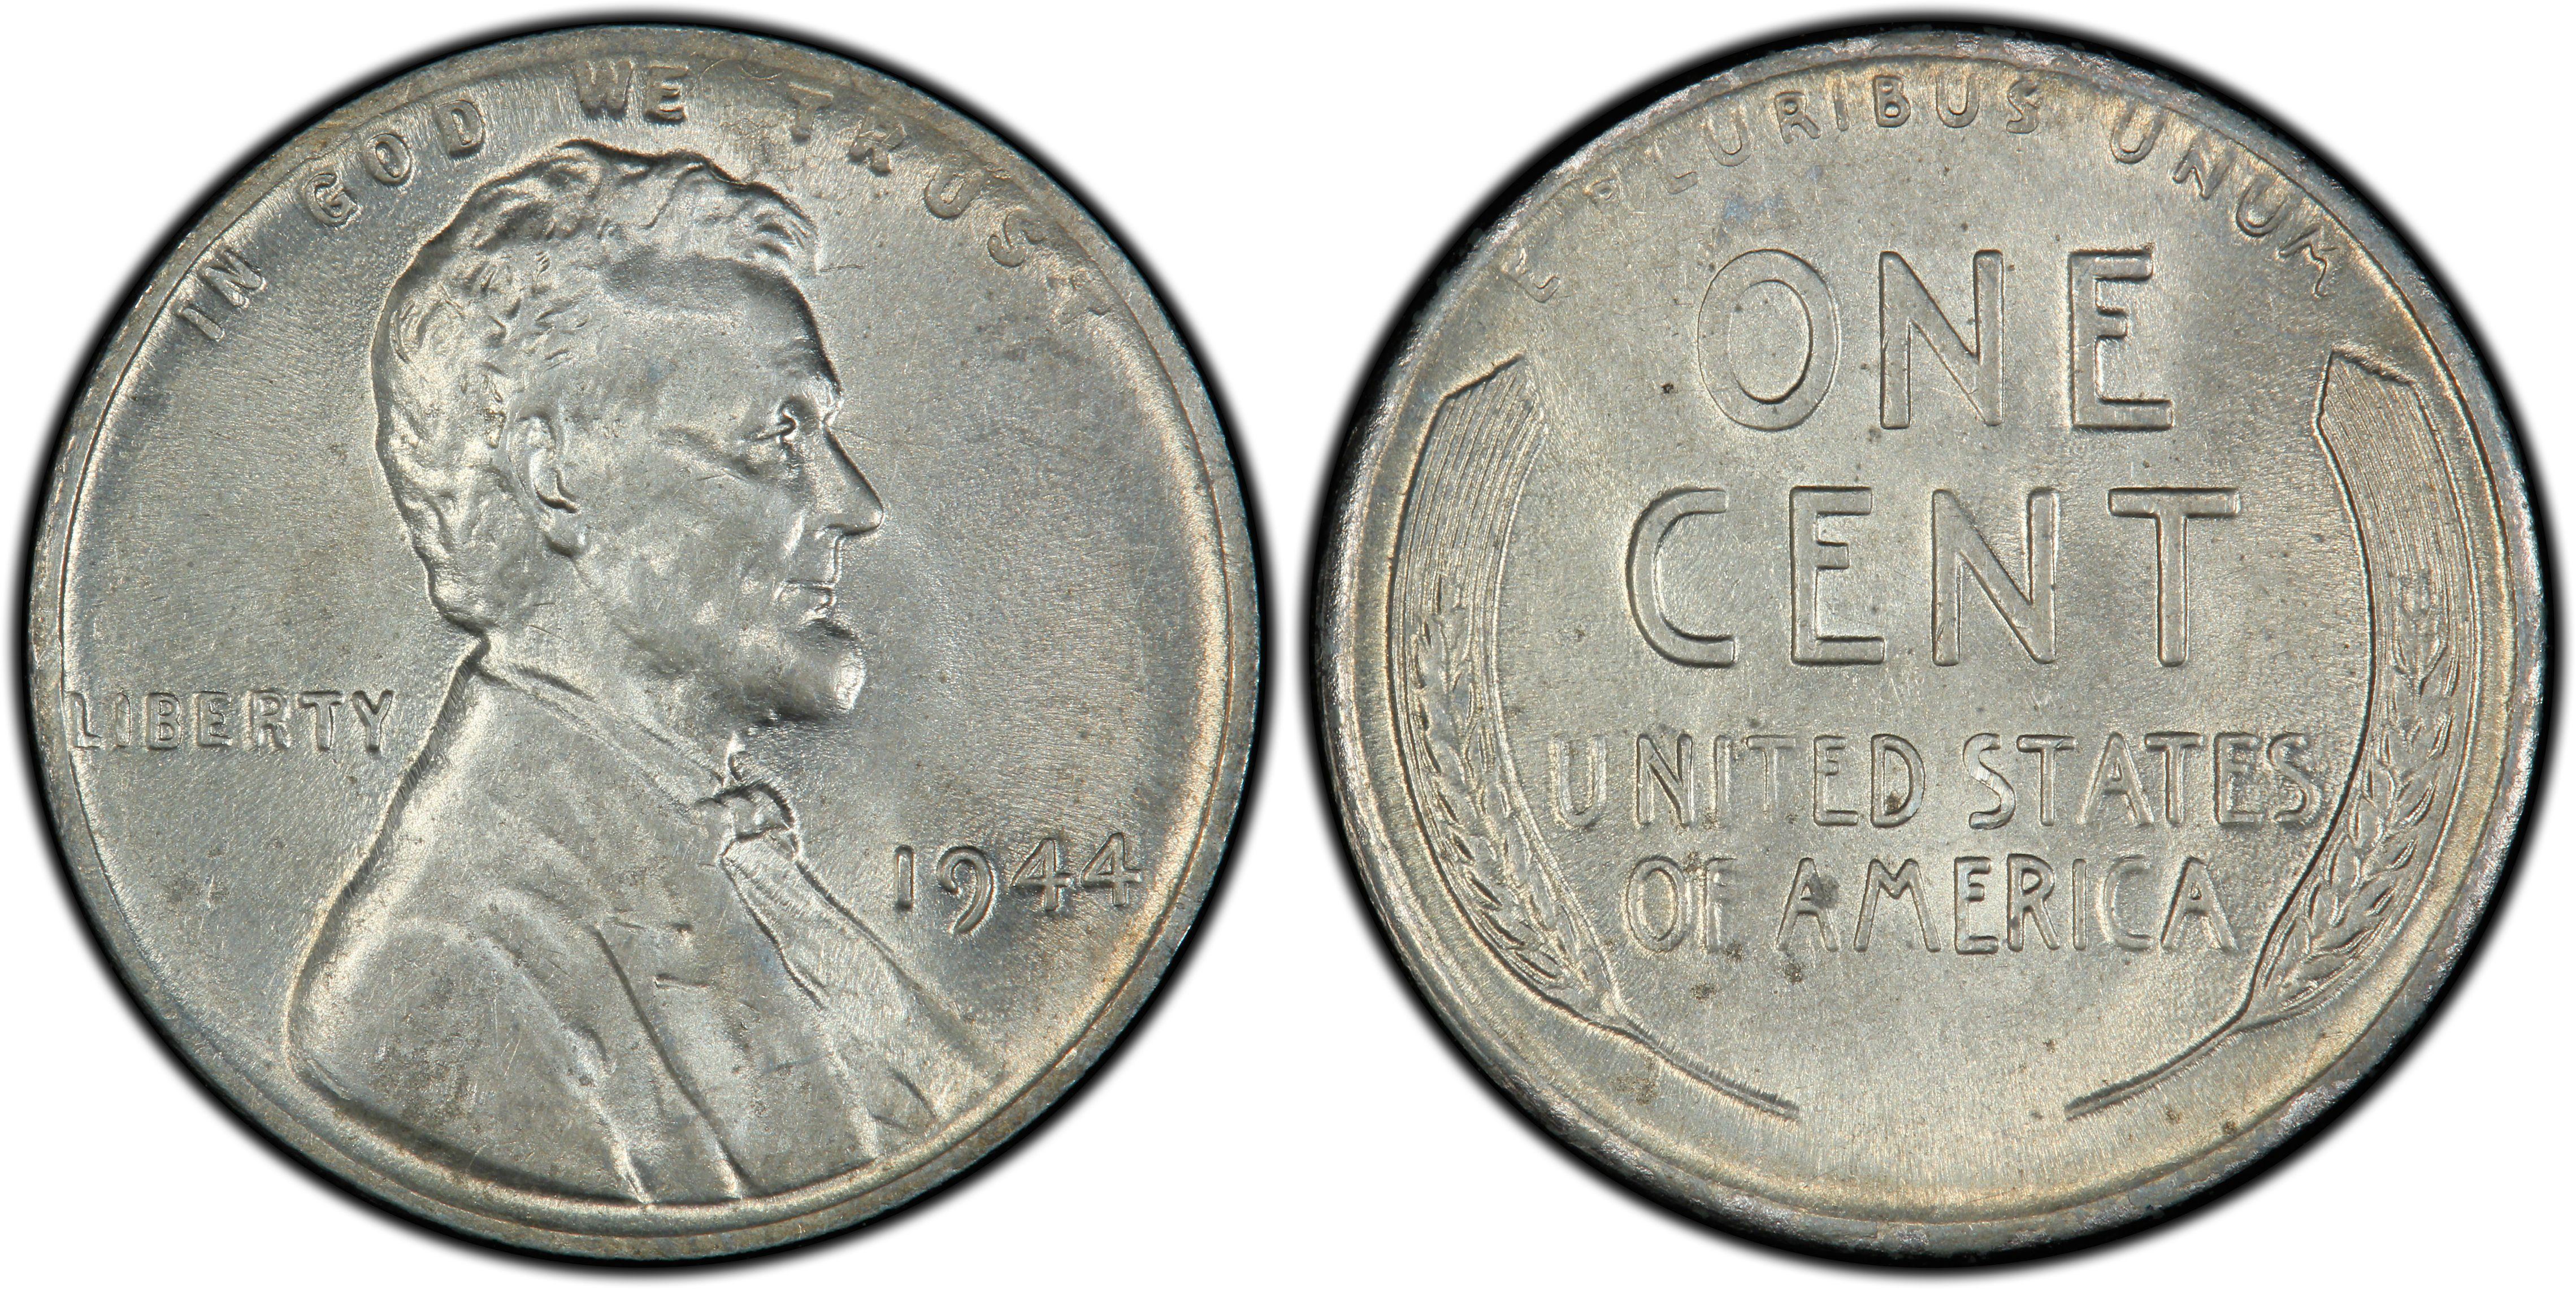 1944-P LINCOLN WHEAT CENT IN UNC//BU CONDITION G-30-17